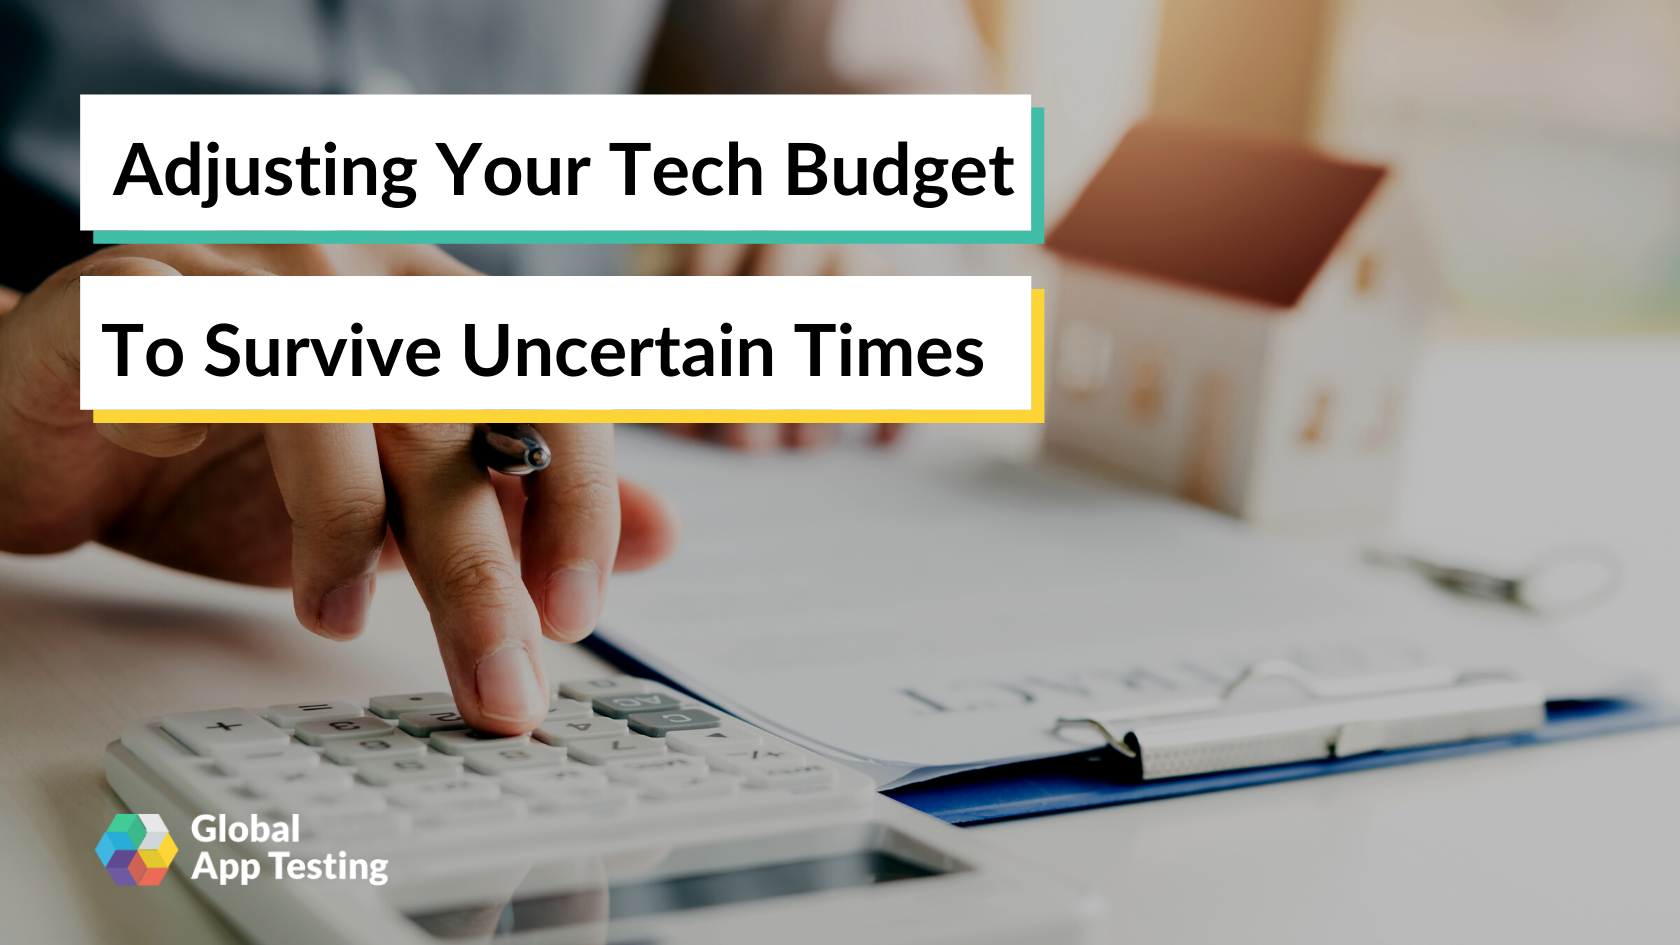 Adjusting Your Tech Budget